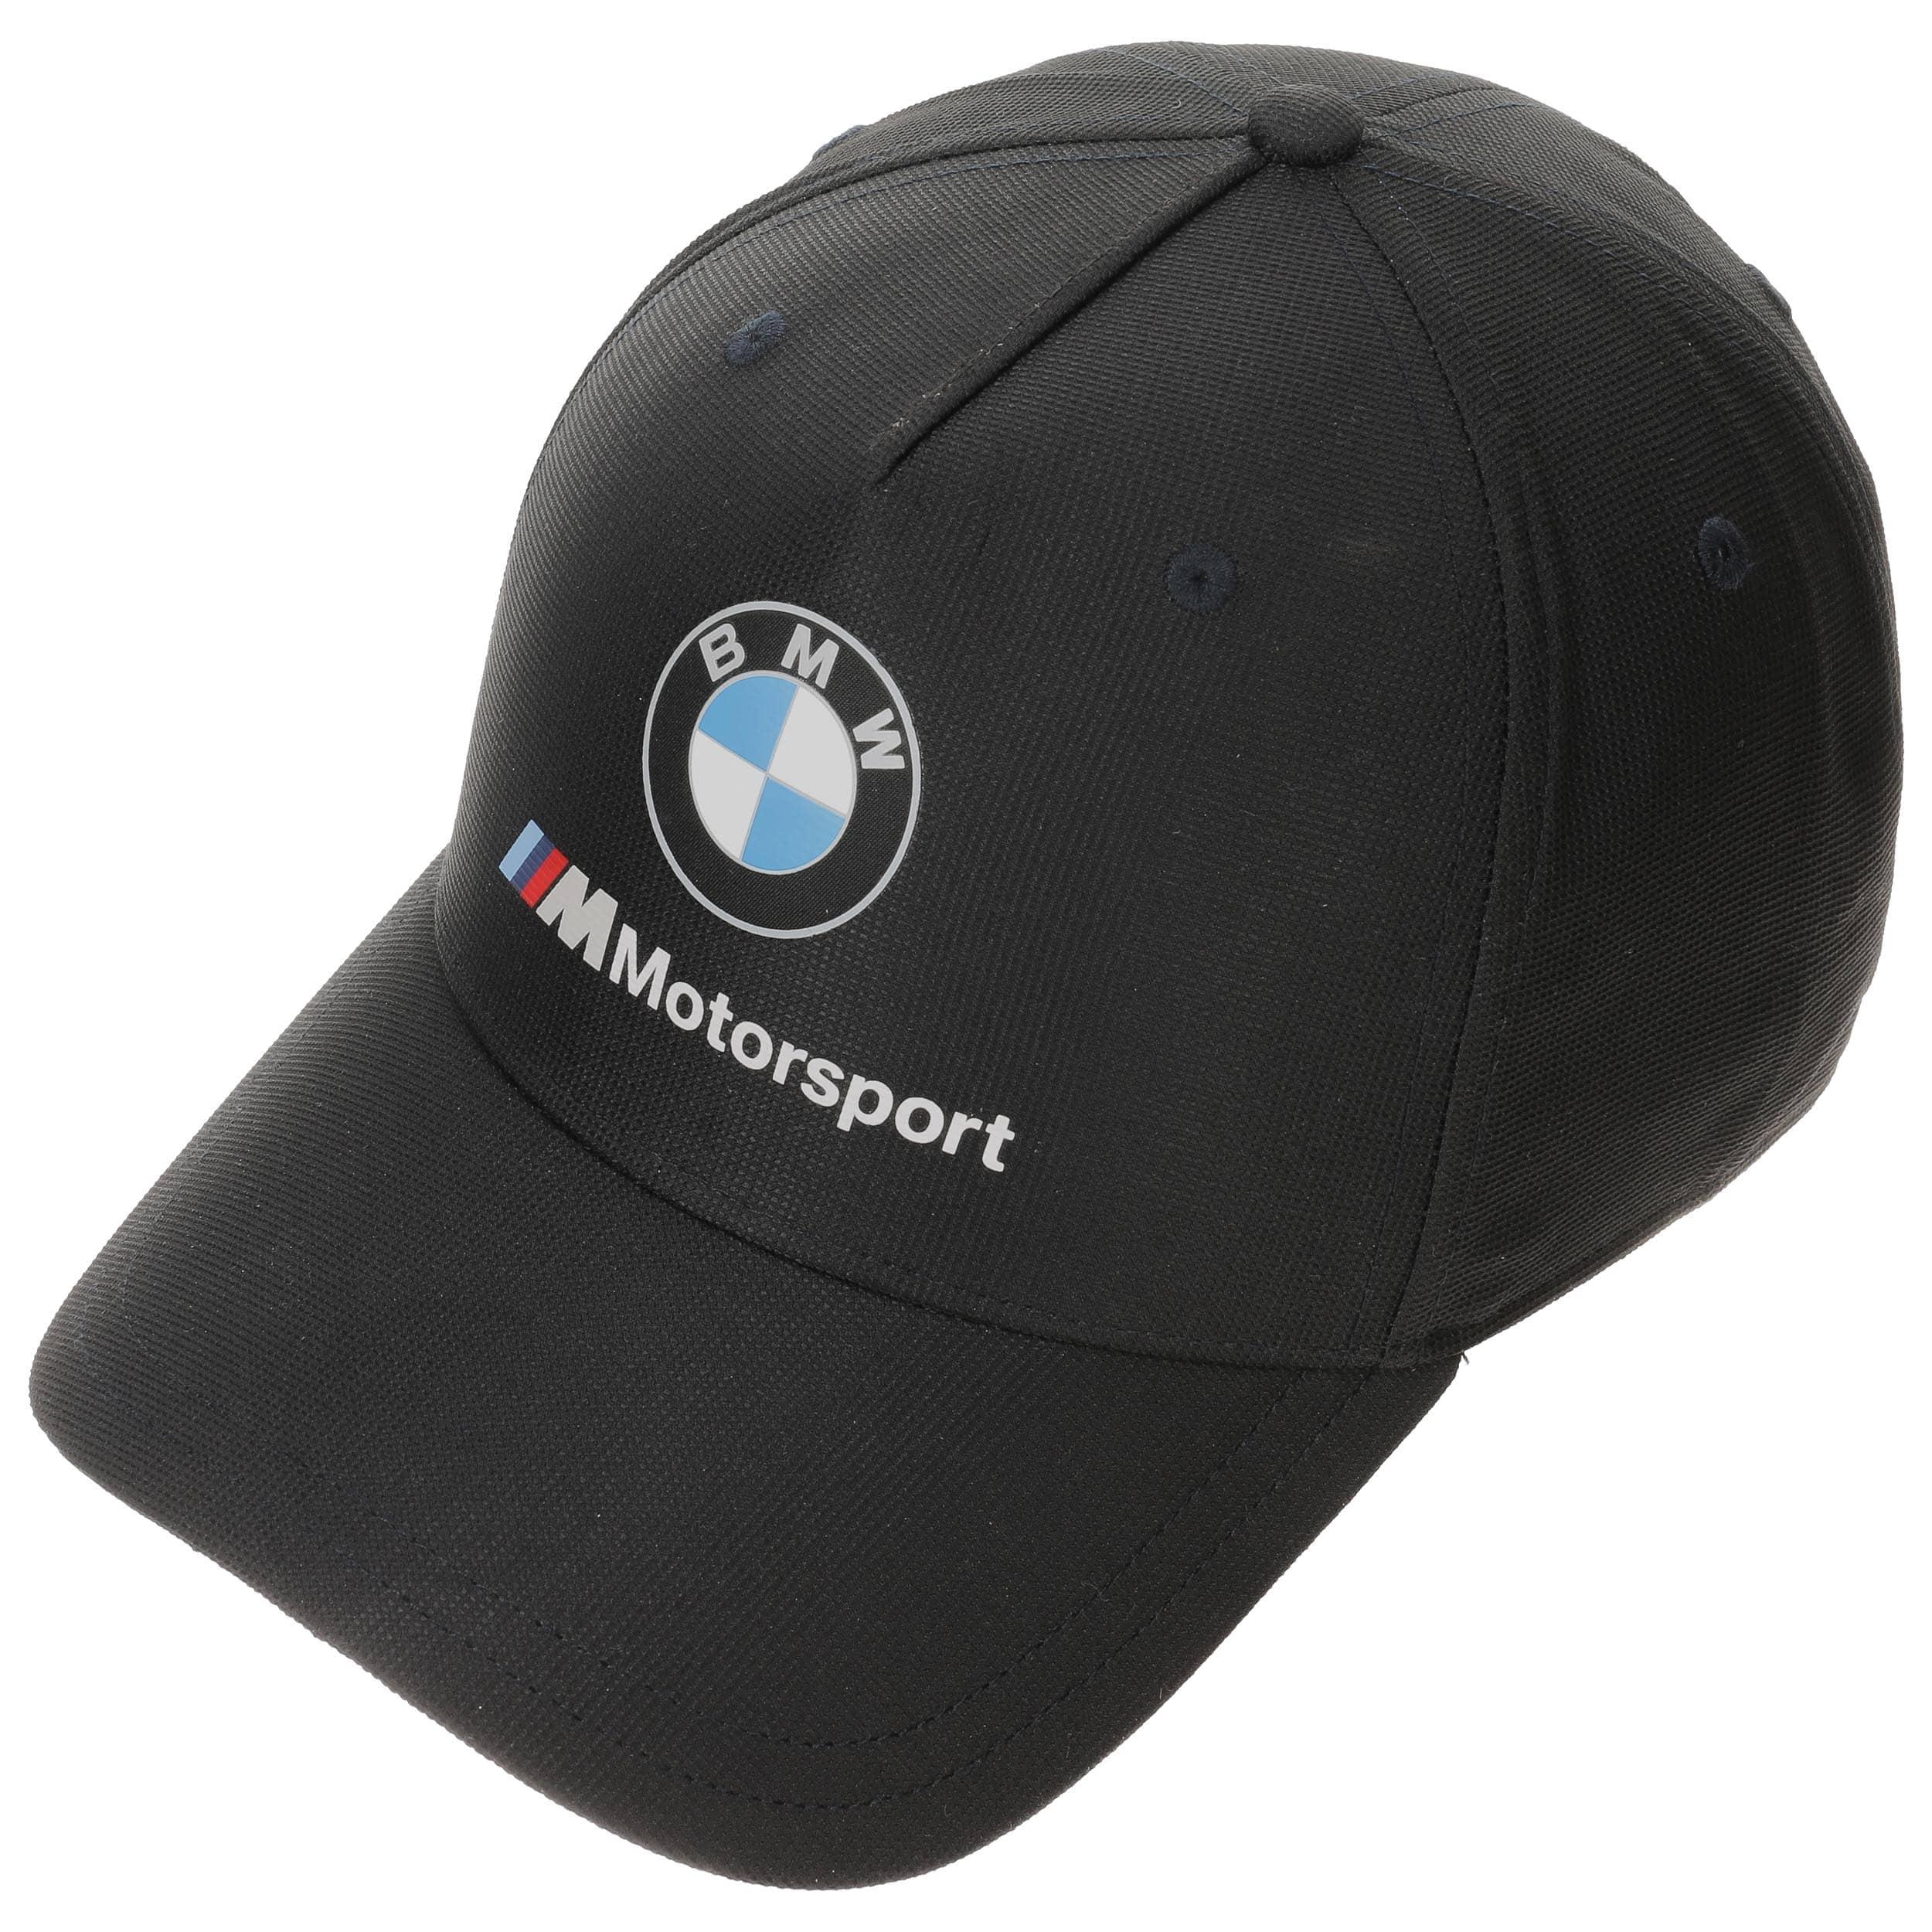 ... official store bmw motorsport cap by puma anthracite 1 1f6ae 9e830 8410c8e13477